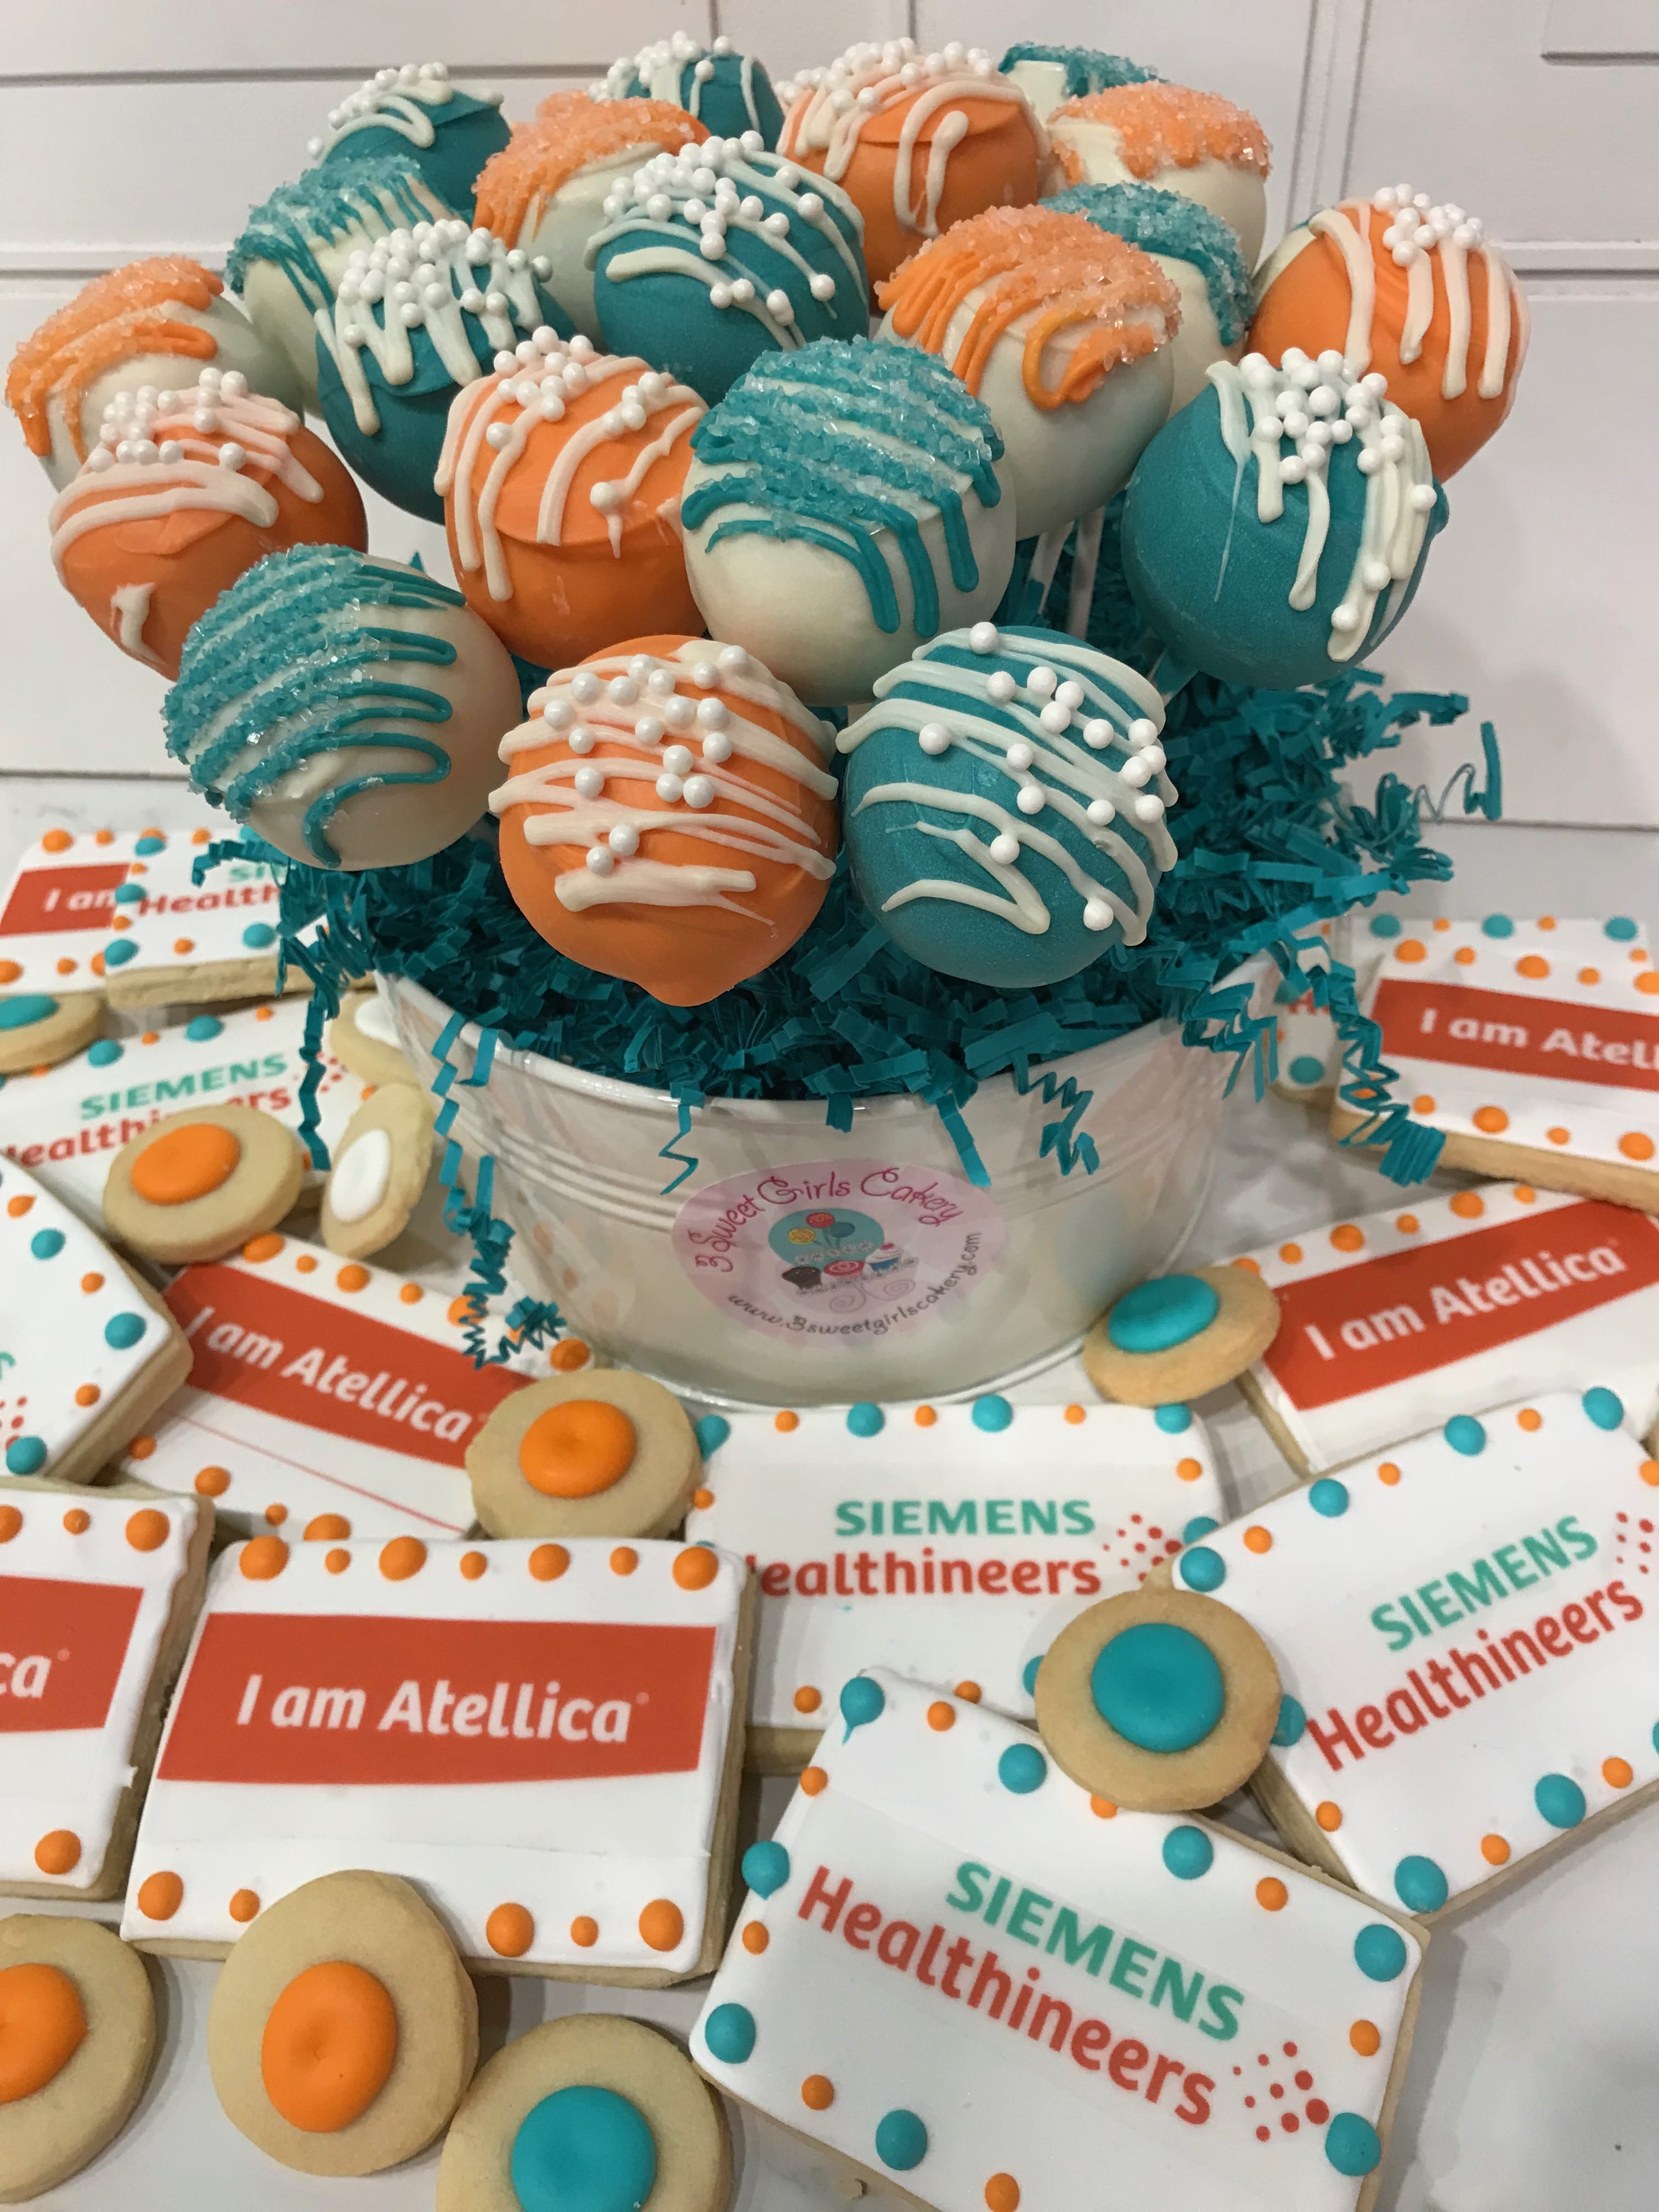 Siemens Logo Cookies and Cake Pops | 3 Sweet Girls Cakery